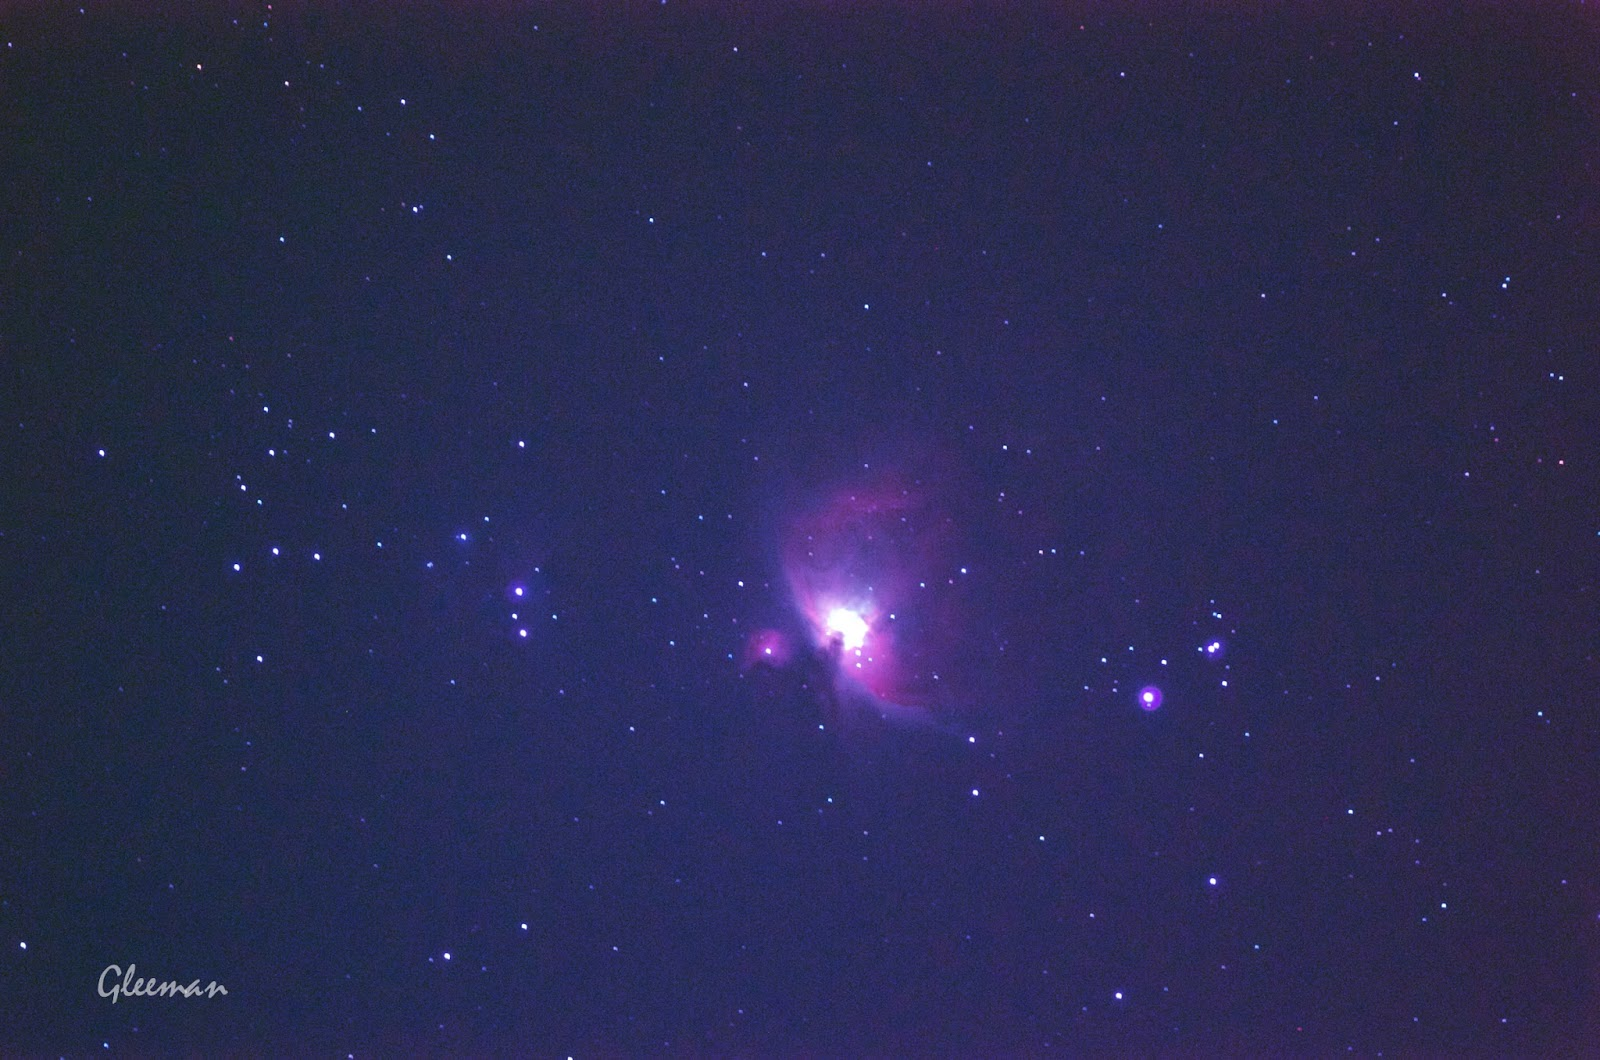 m42獵戶座大星雲 Pentax 75SDHF +K5, O-GPS1 astrotracker, Kenko HF 濾鏡 , ISO6400 40秒單張。